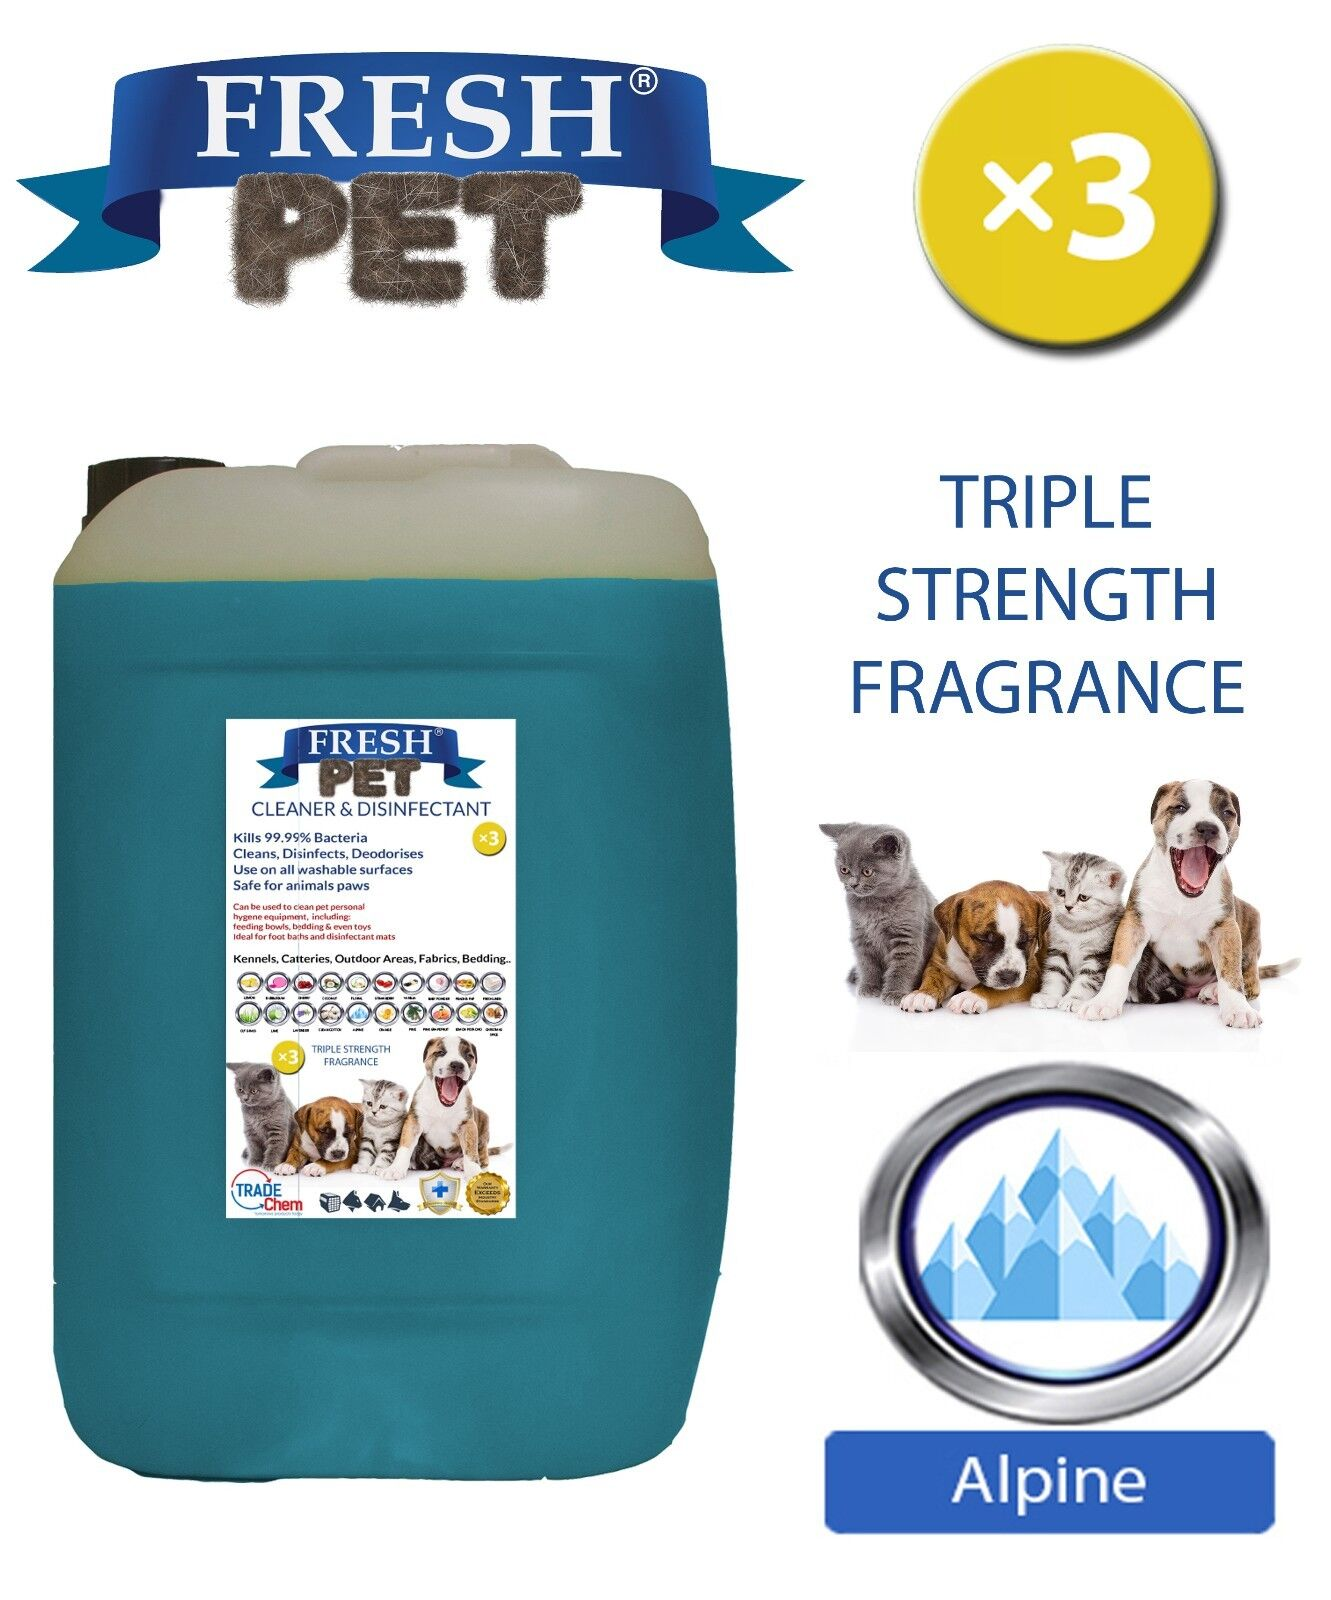 Fresh Pet Kennel Dog DISINFETTANTE Tripla Forza fragranza 20 L Alpine